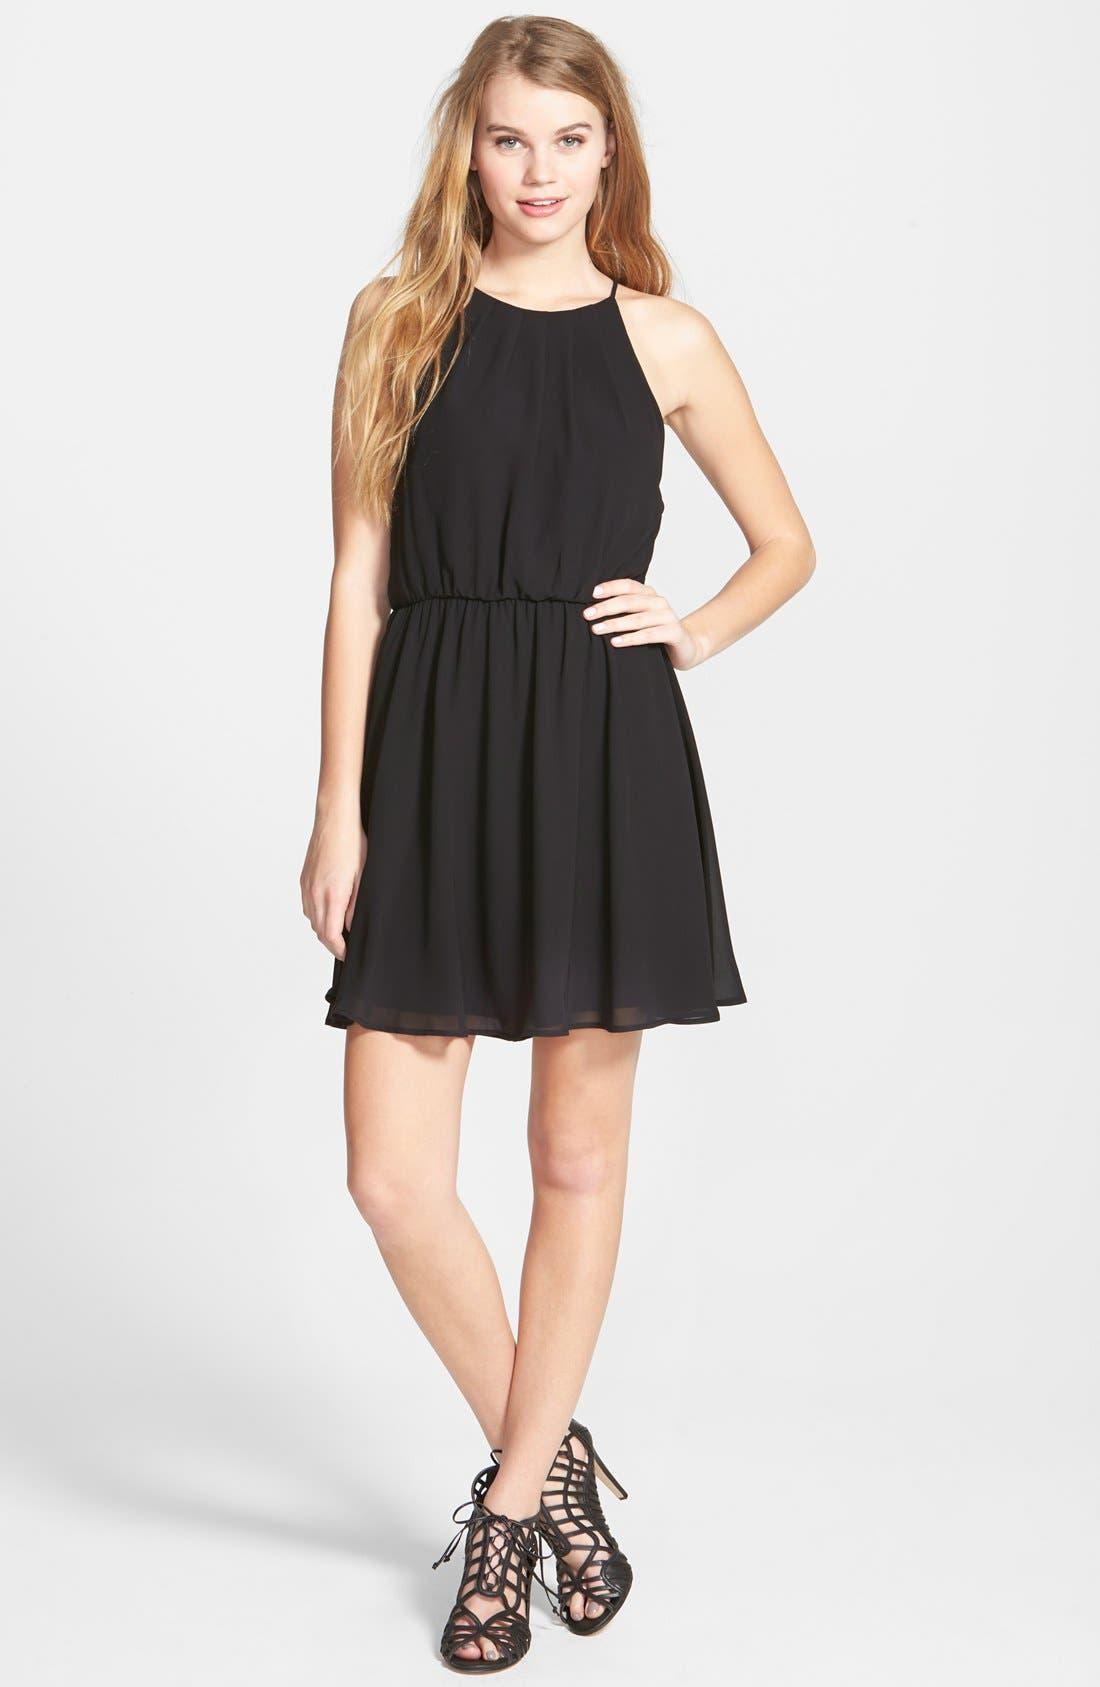 Blouson Chiffon Skater Dress,                         Main,                         color,